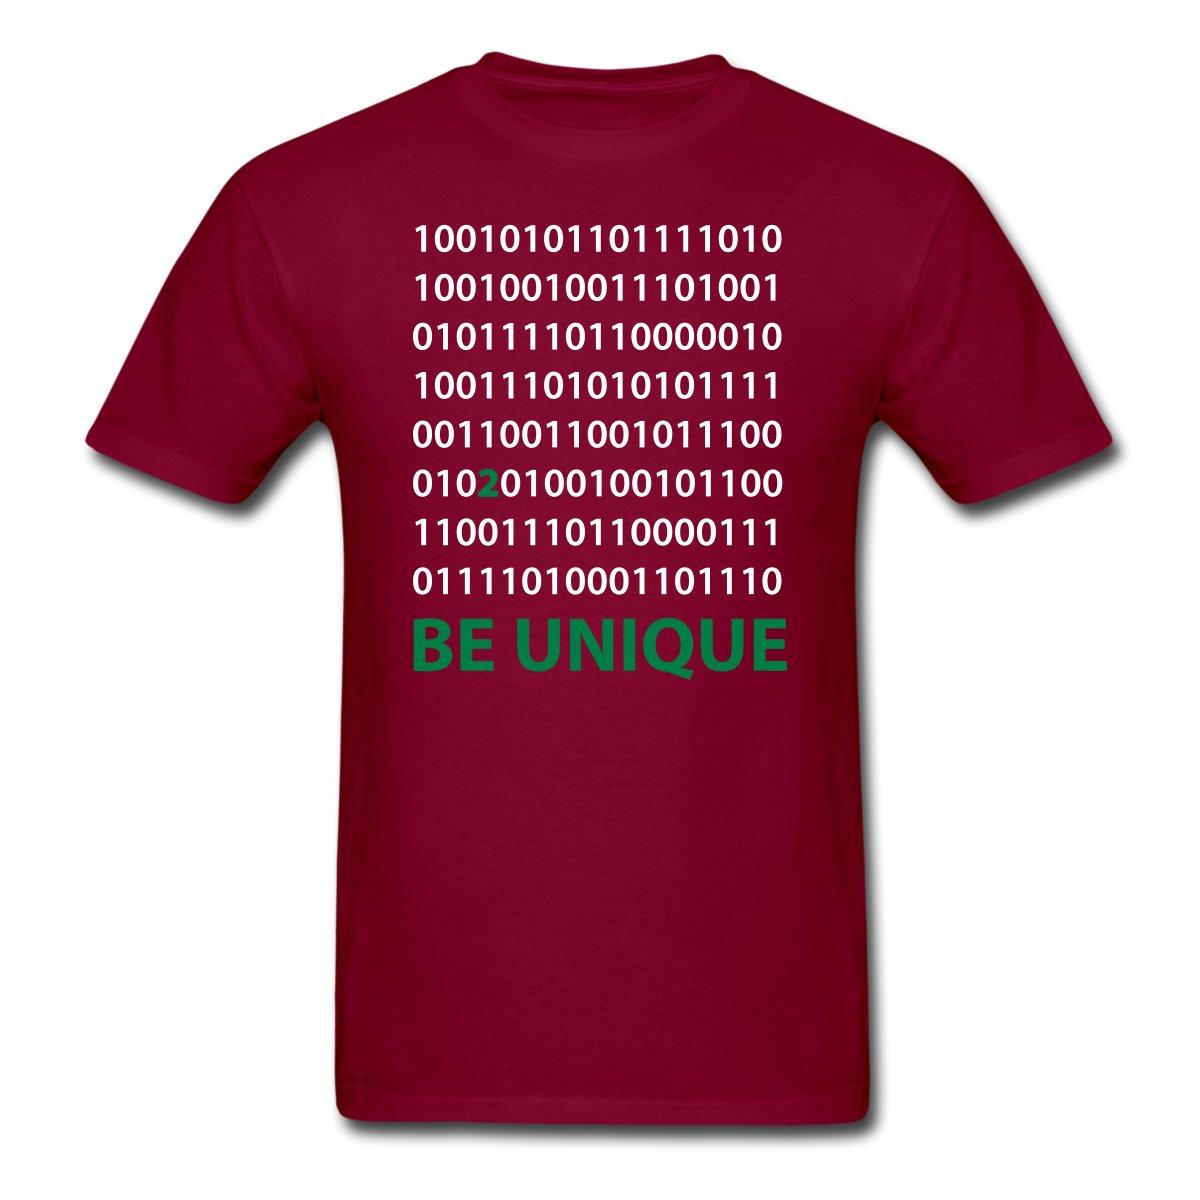 Desain t shirt unik - Menjadi Unik Bilangan Biner Pria T Shirt Desain T Shirt Men S Hal Hal